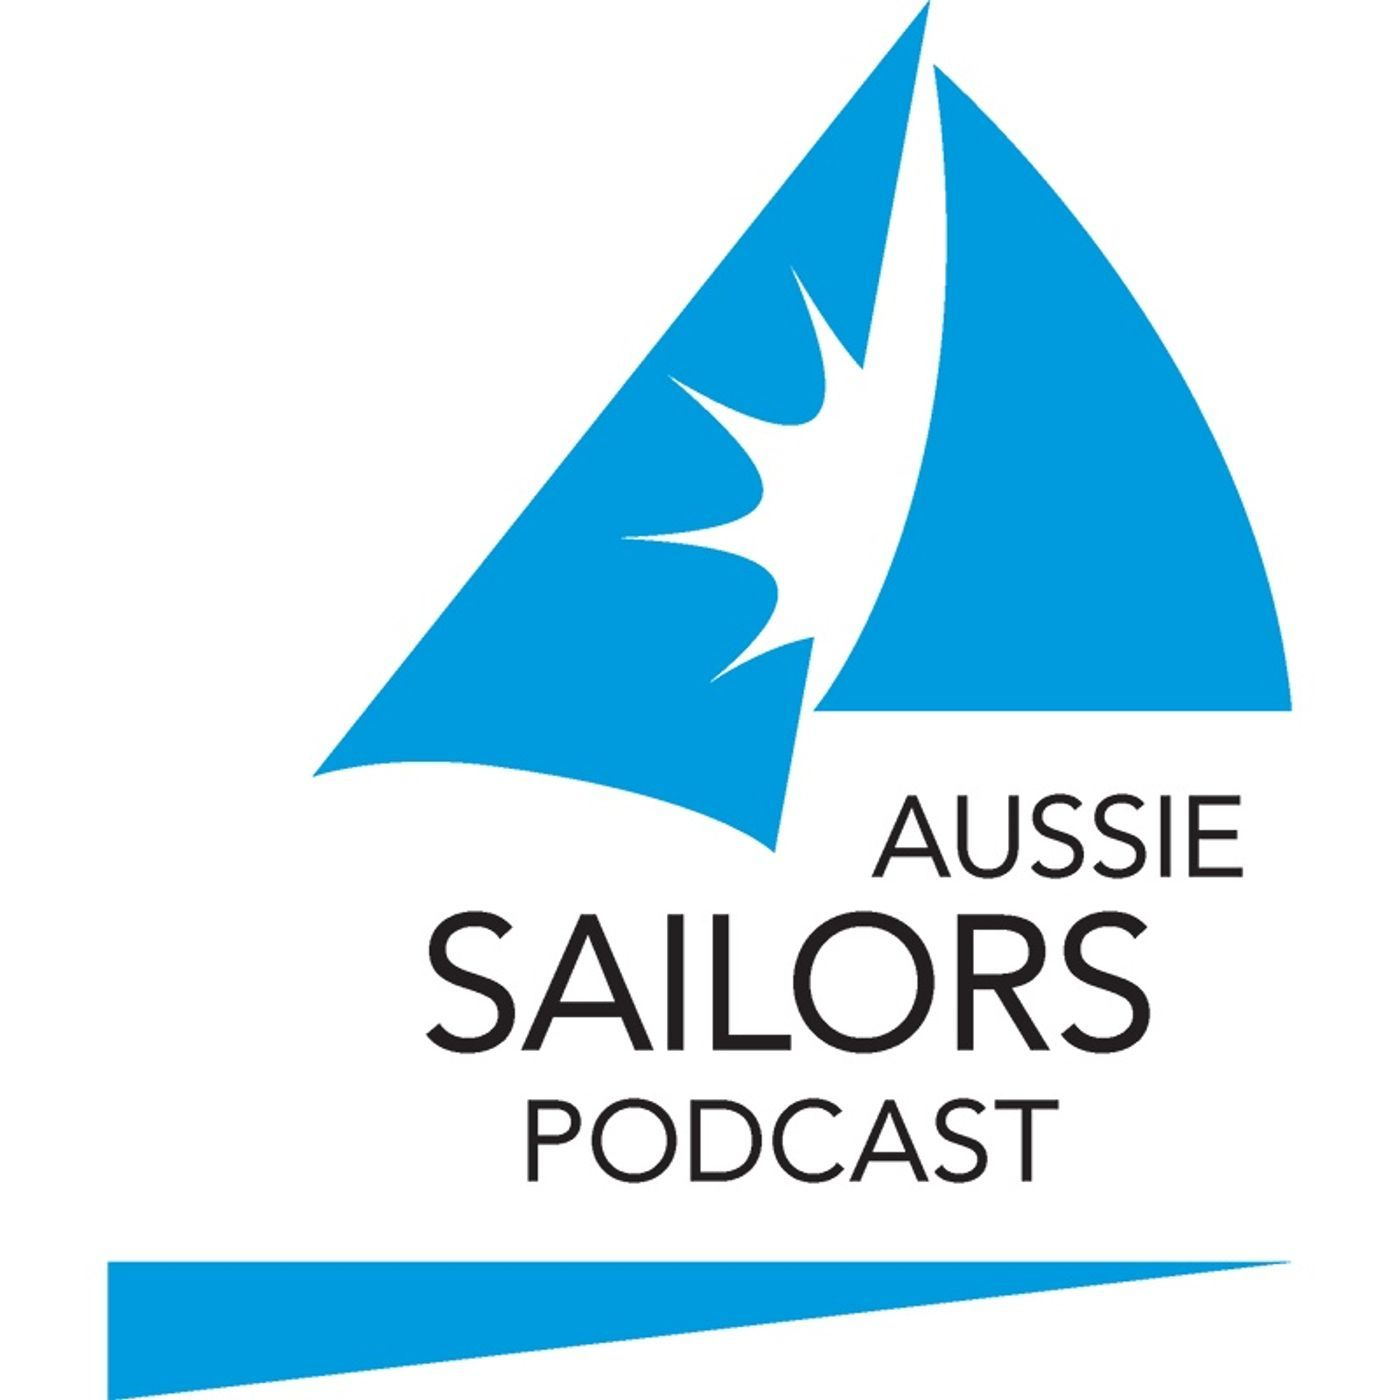 Aussie Sailors Podcast Episode 1